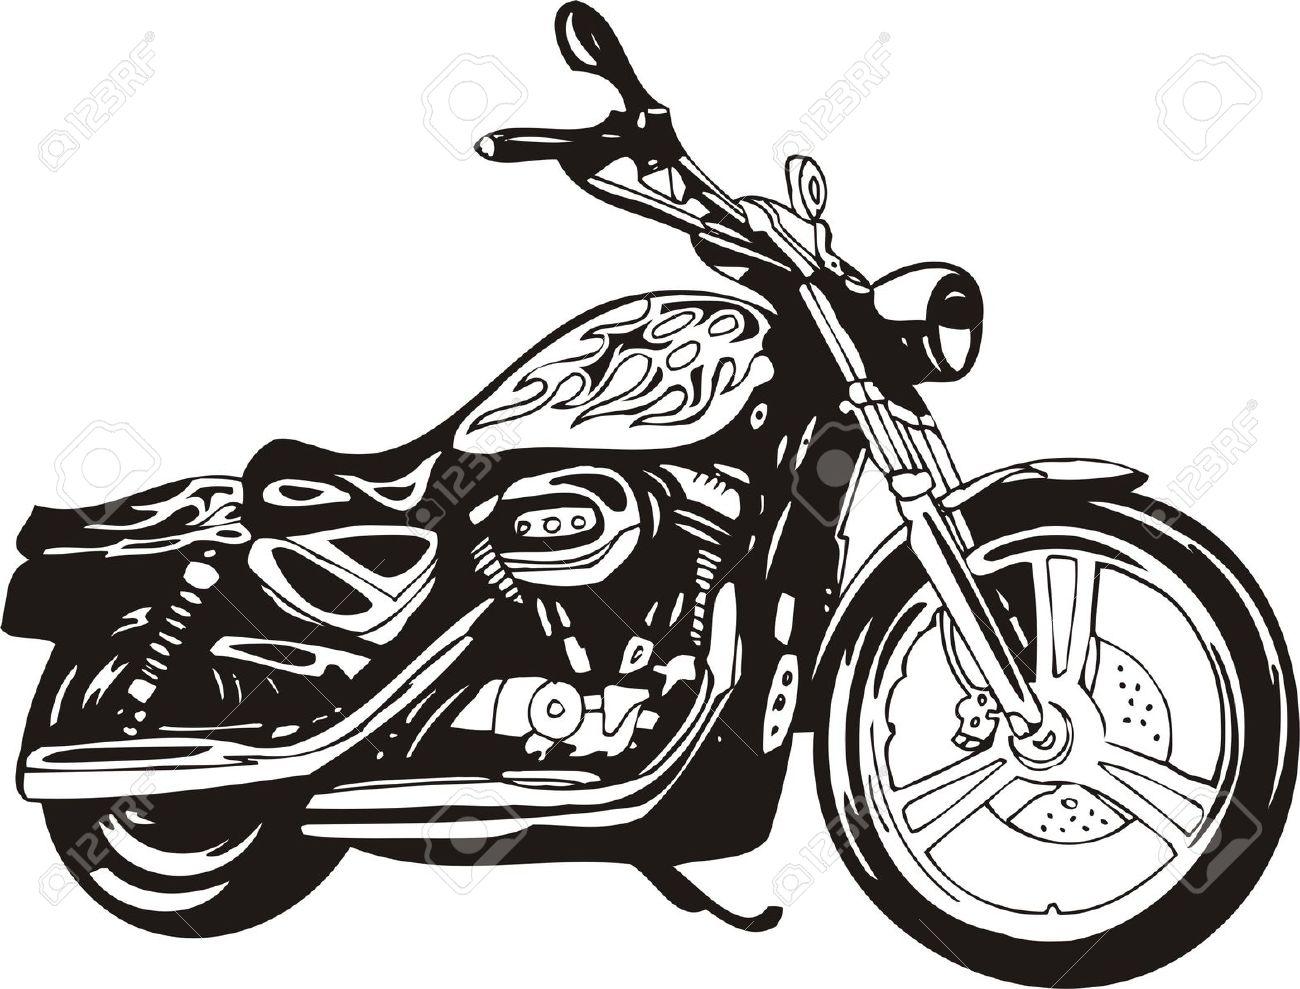 Harley davidson motorcycles clipart.